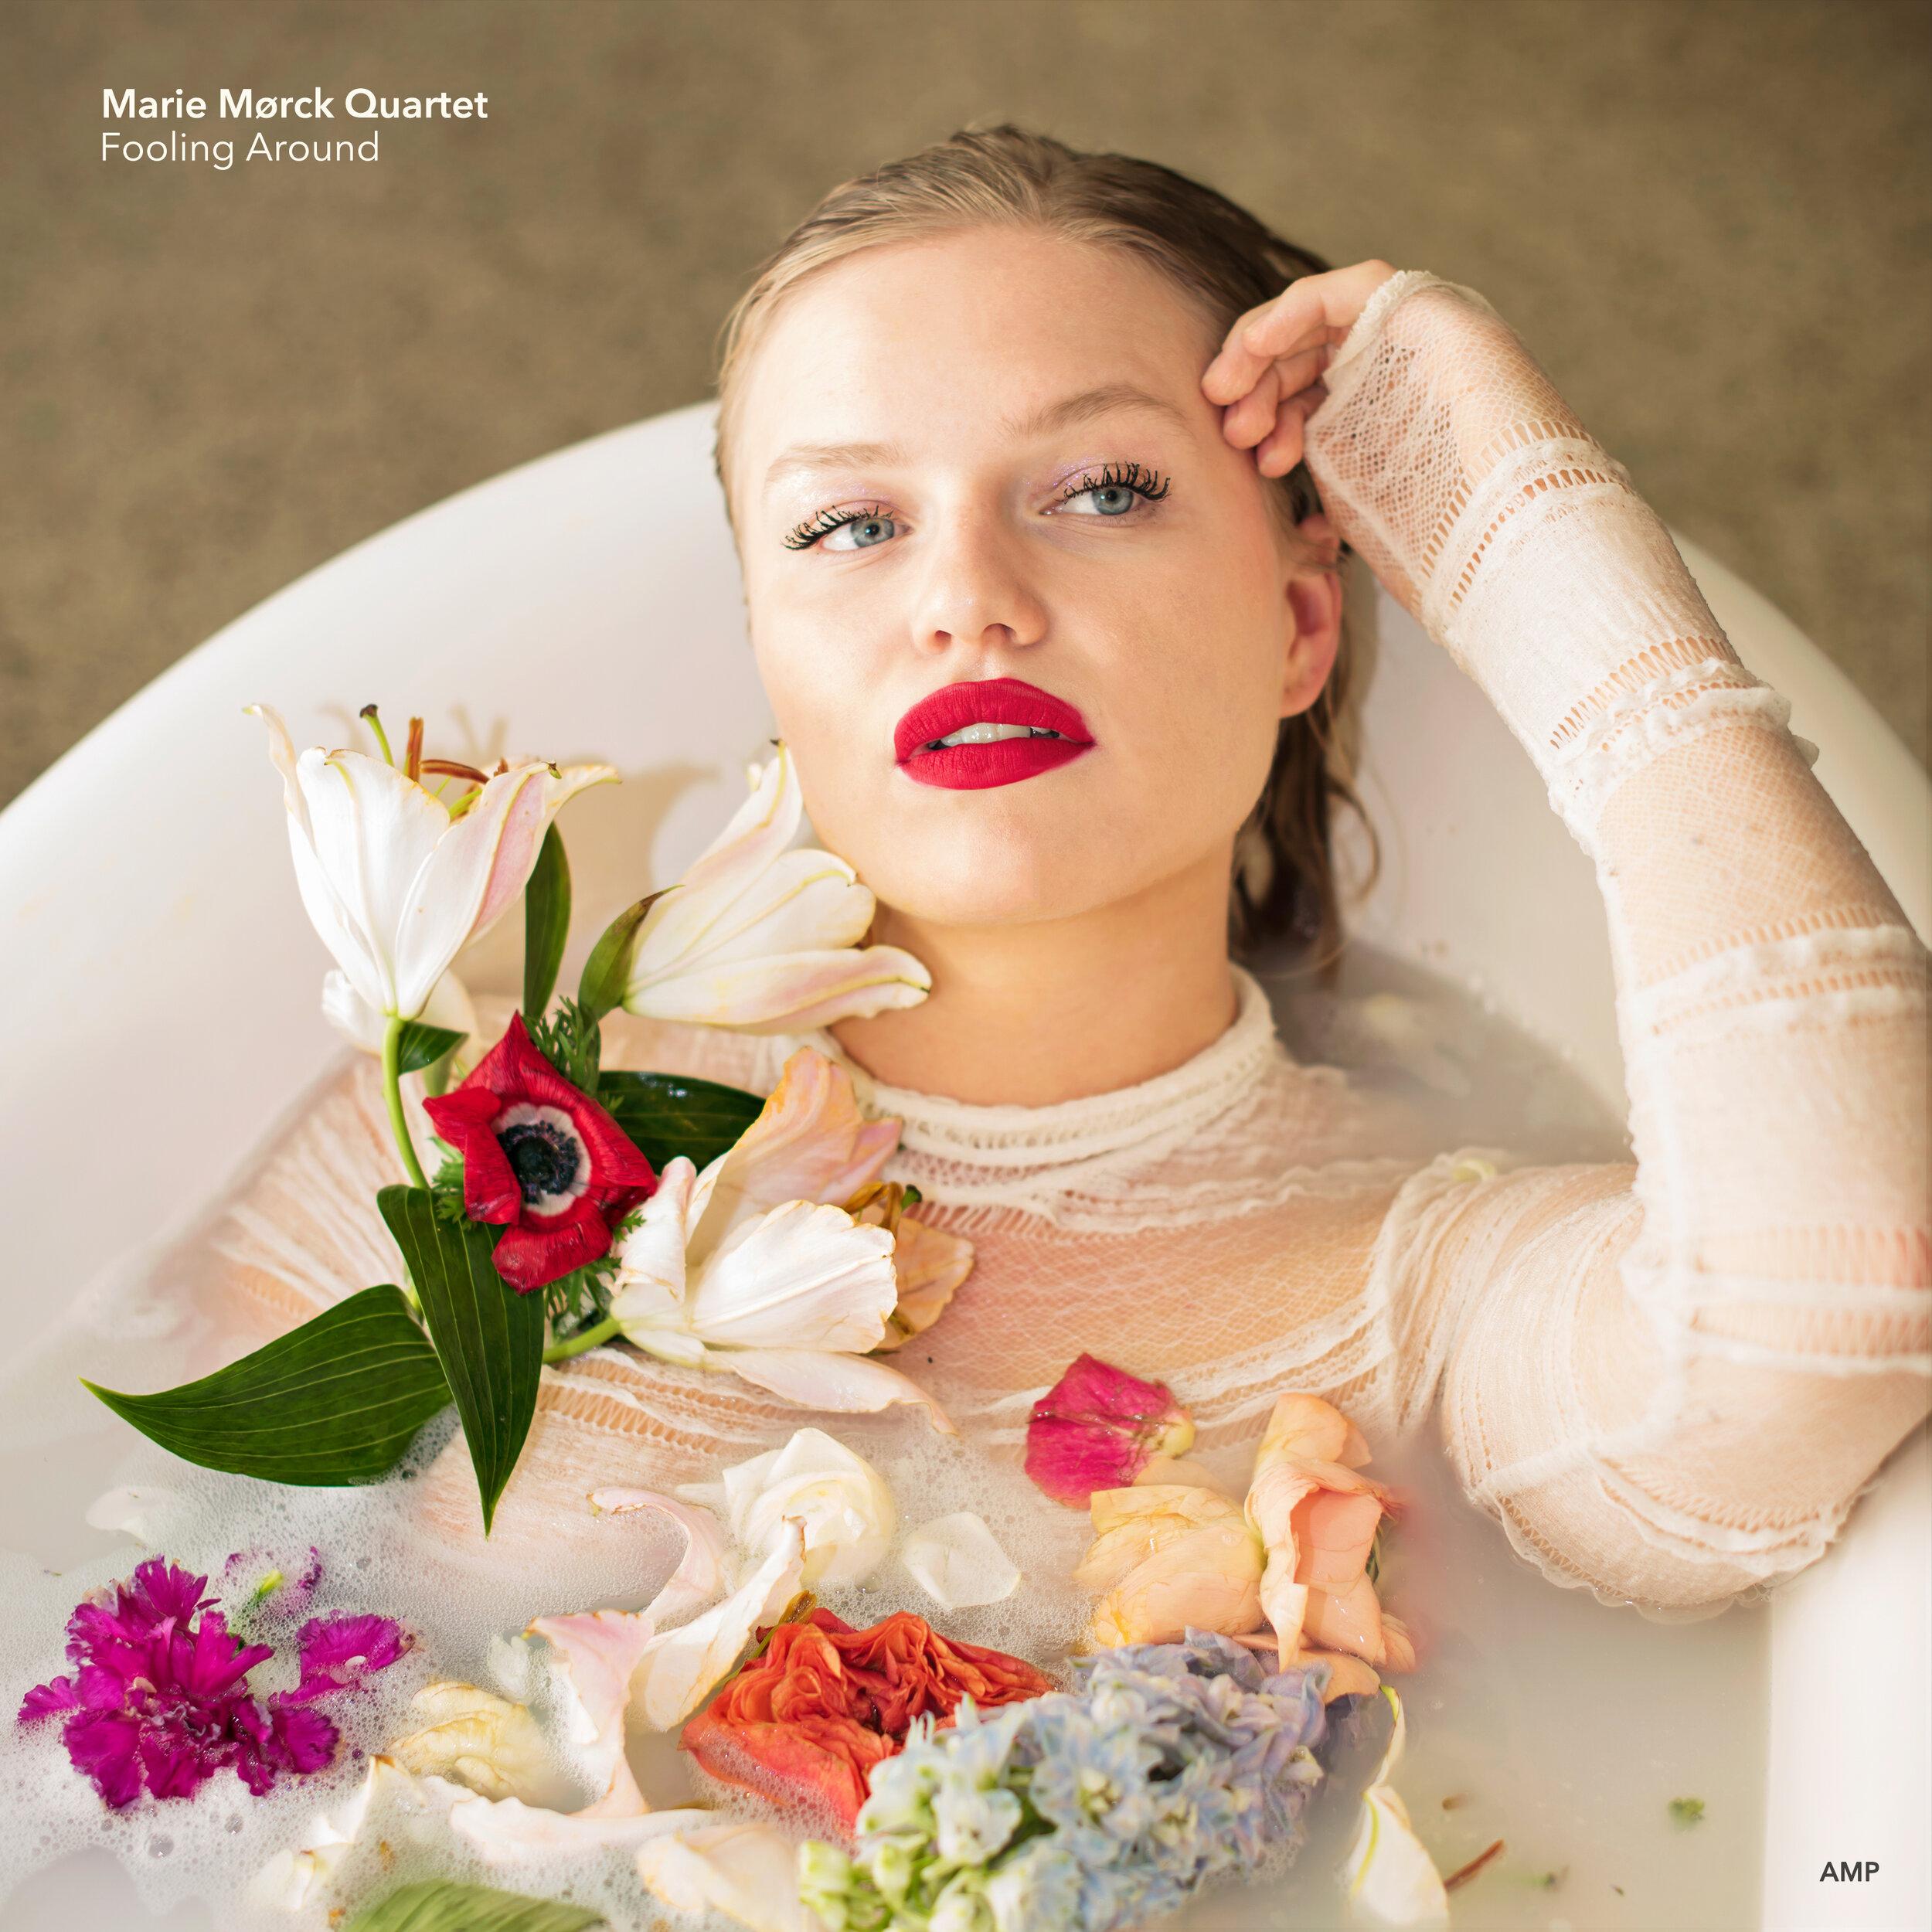 Картинки по запросу Marie Mørck Quartet